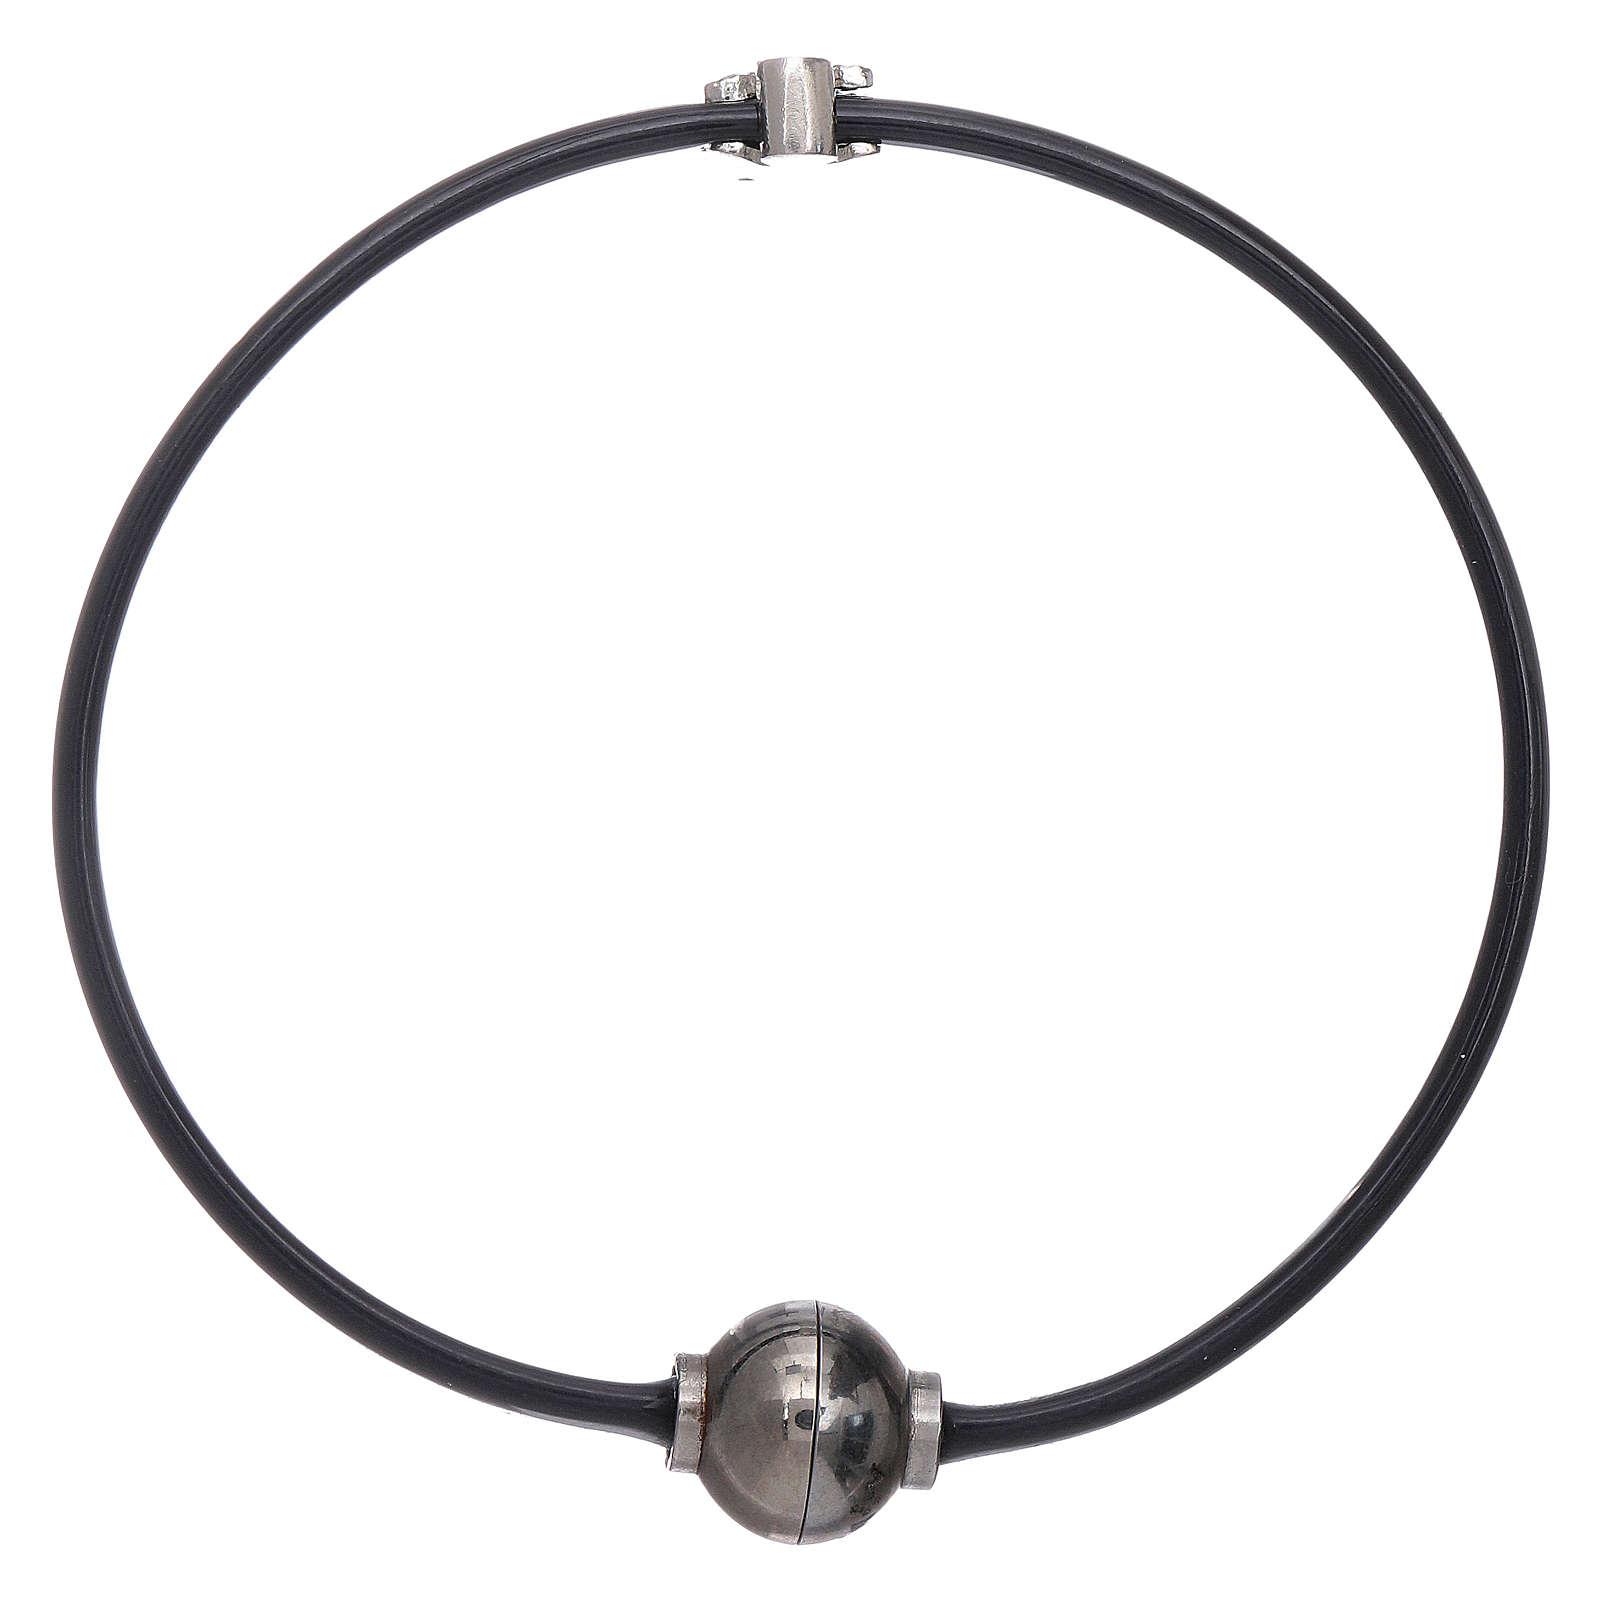 AMEN thermoplastic 925 sterling silver bracelet with a zirconate angel insert 4